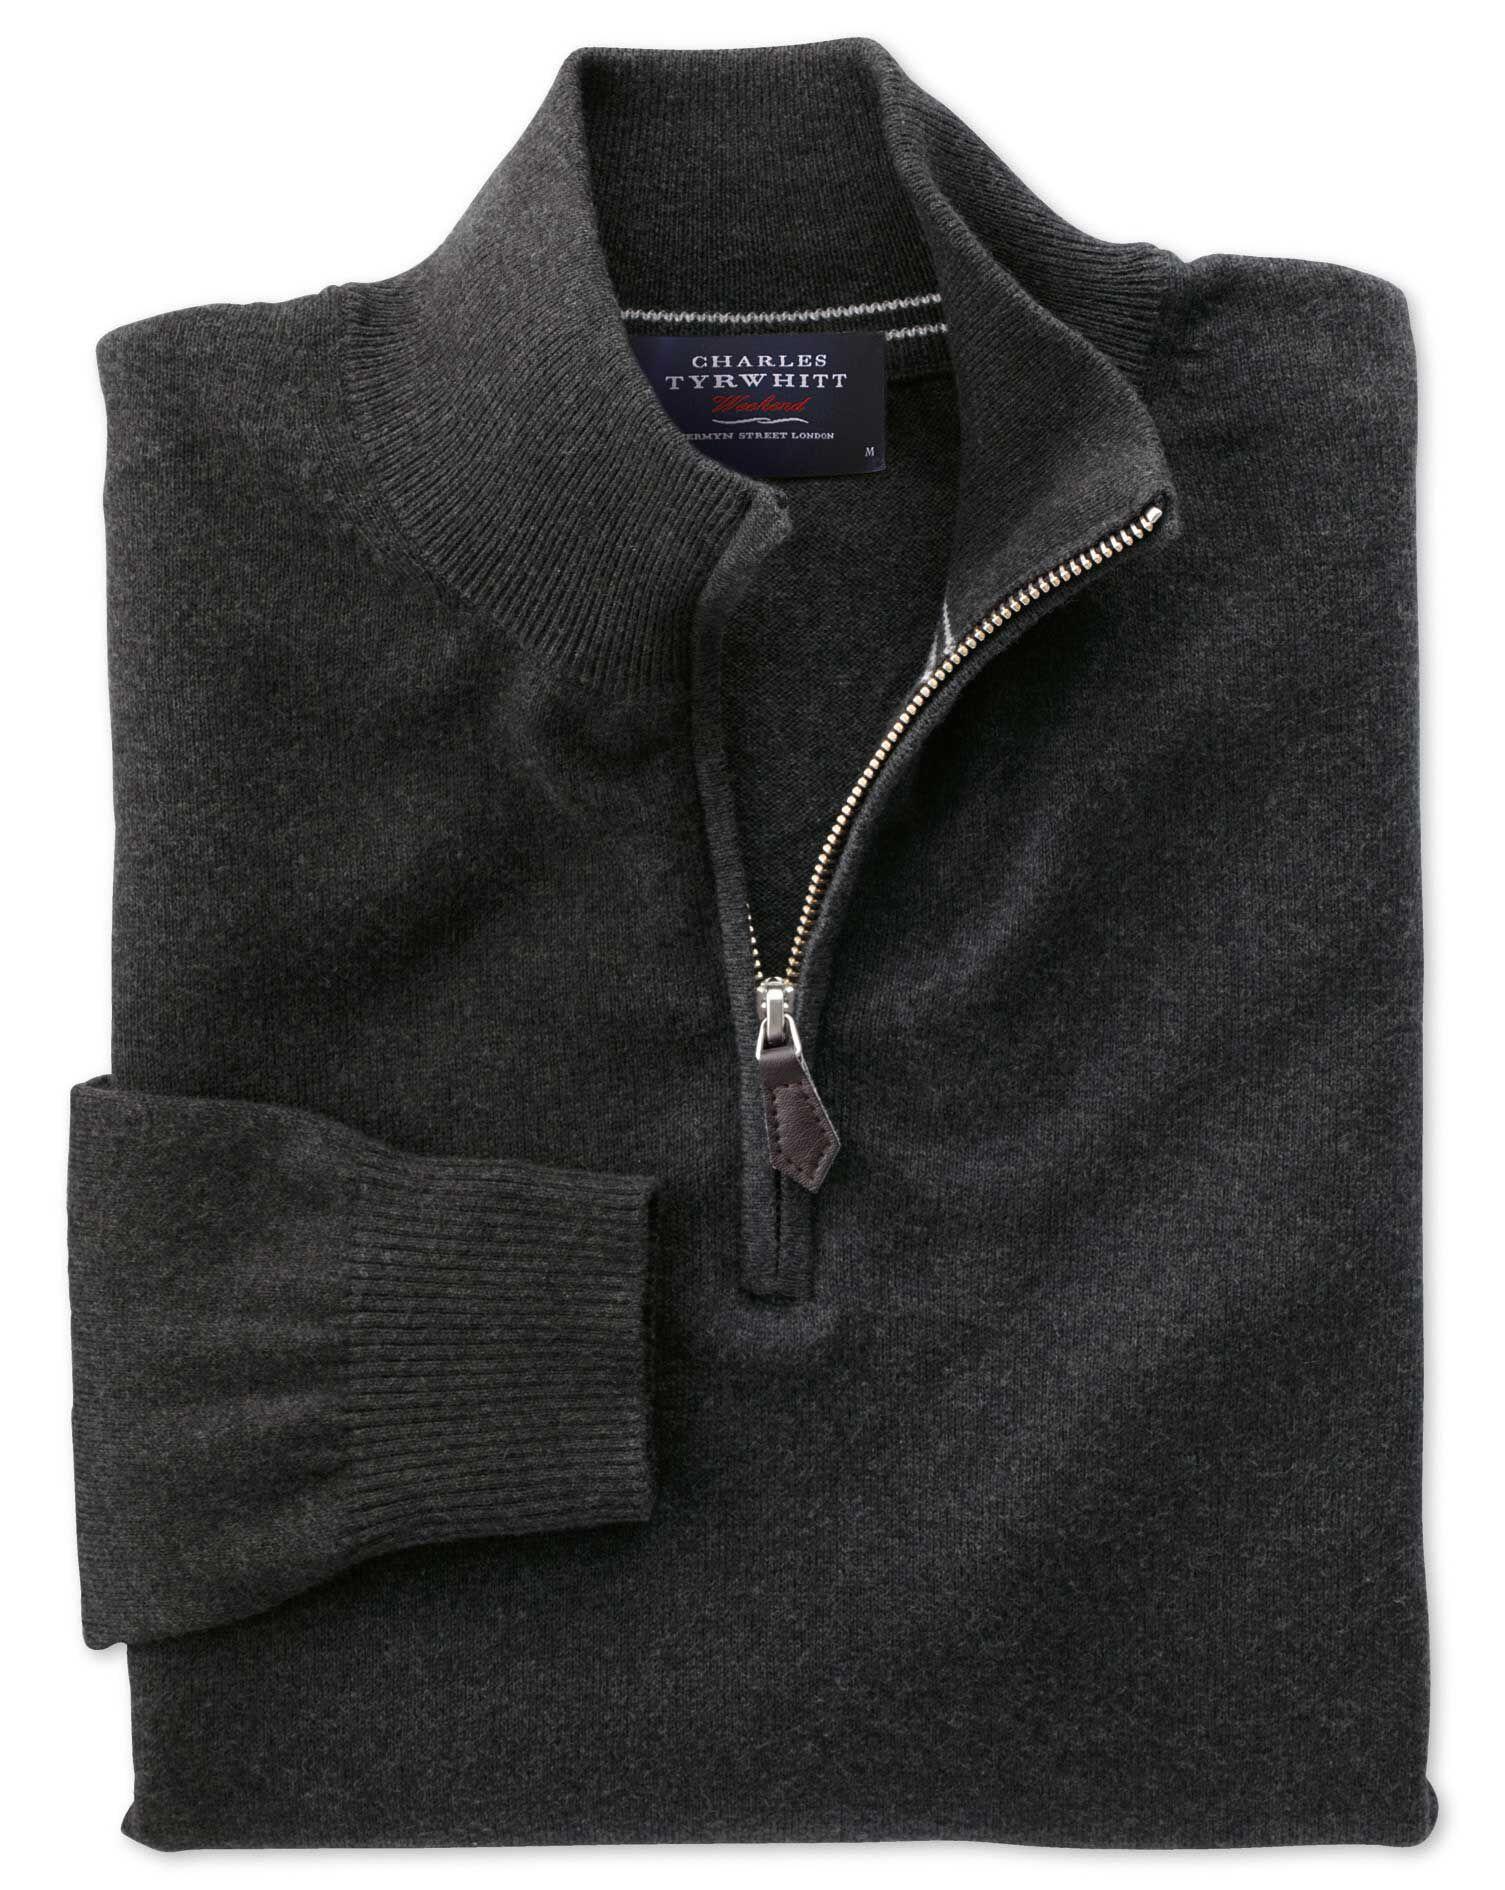 Charcoal Cotton Cashmere Zip Neck Jumper Size XXXL by Charles Tyrwhitt